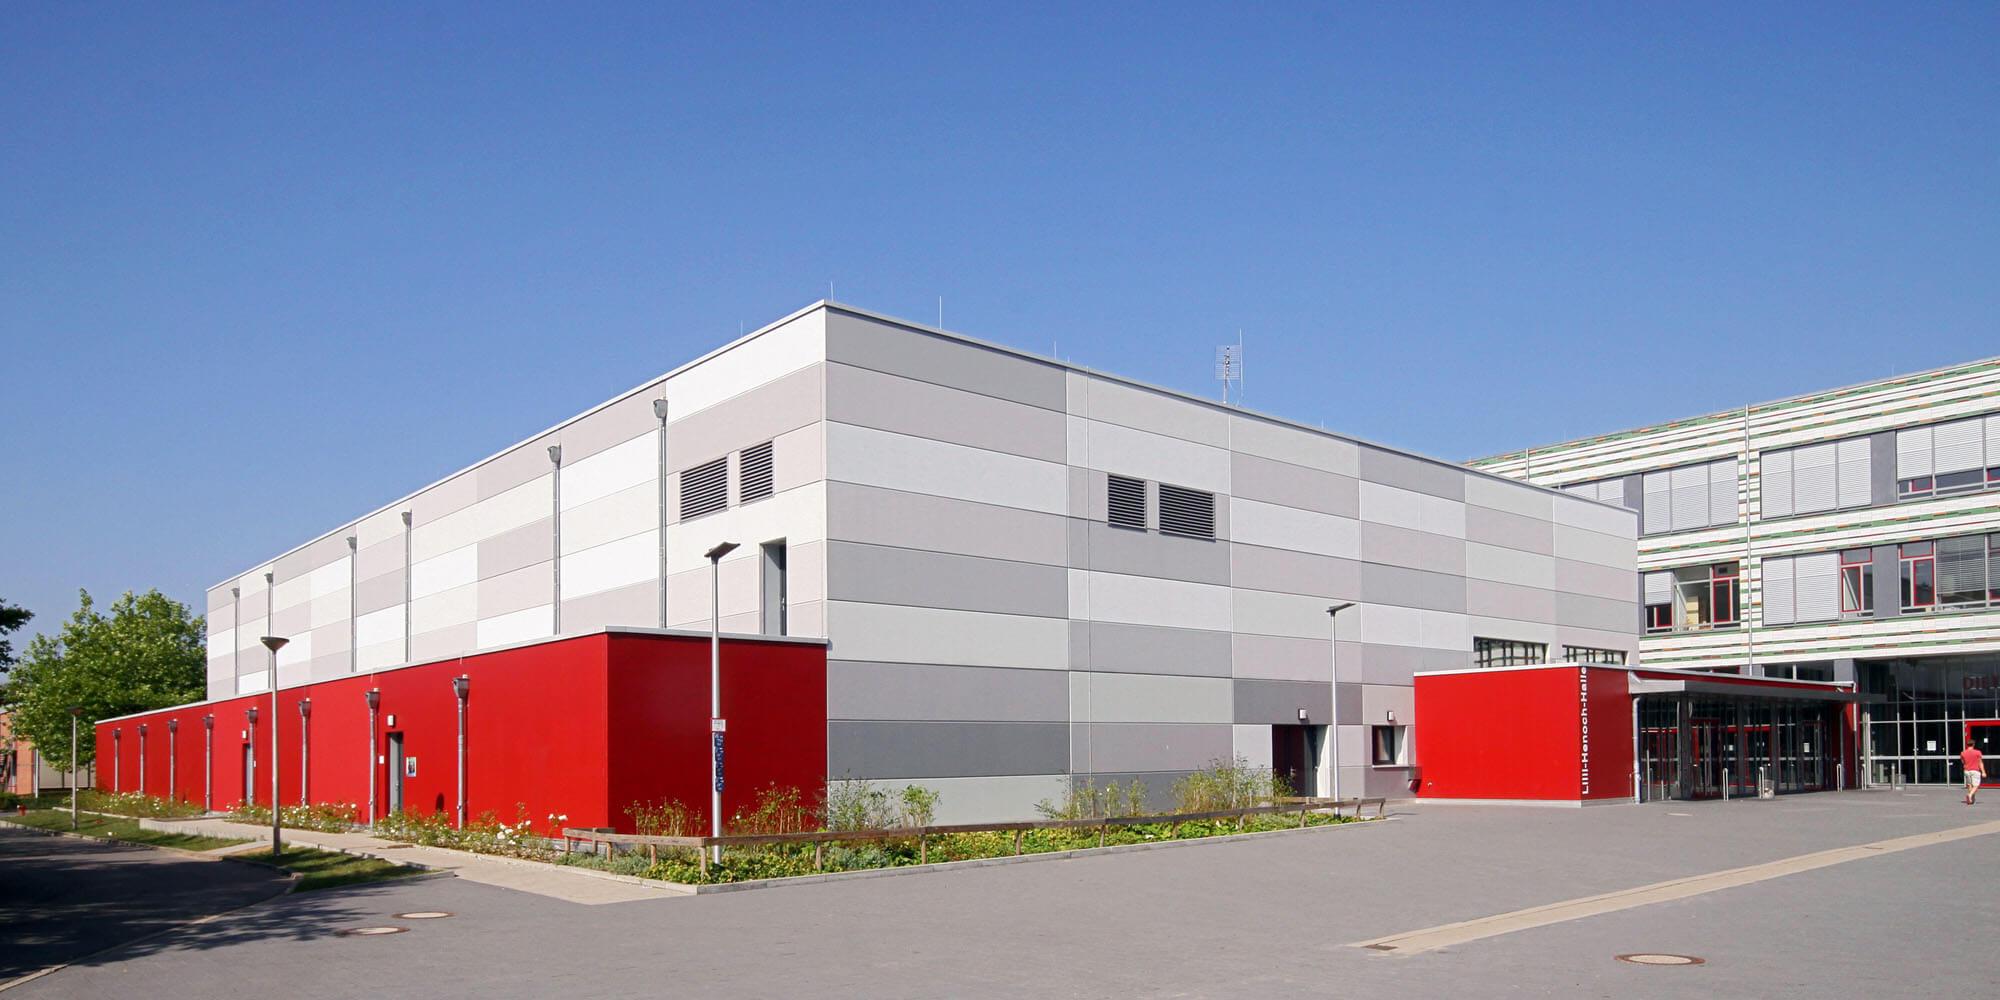 Turnhalle Lilli-Henoch-Schule, Quickborn